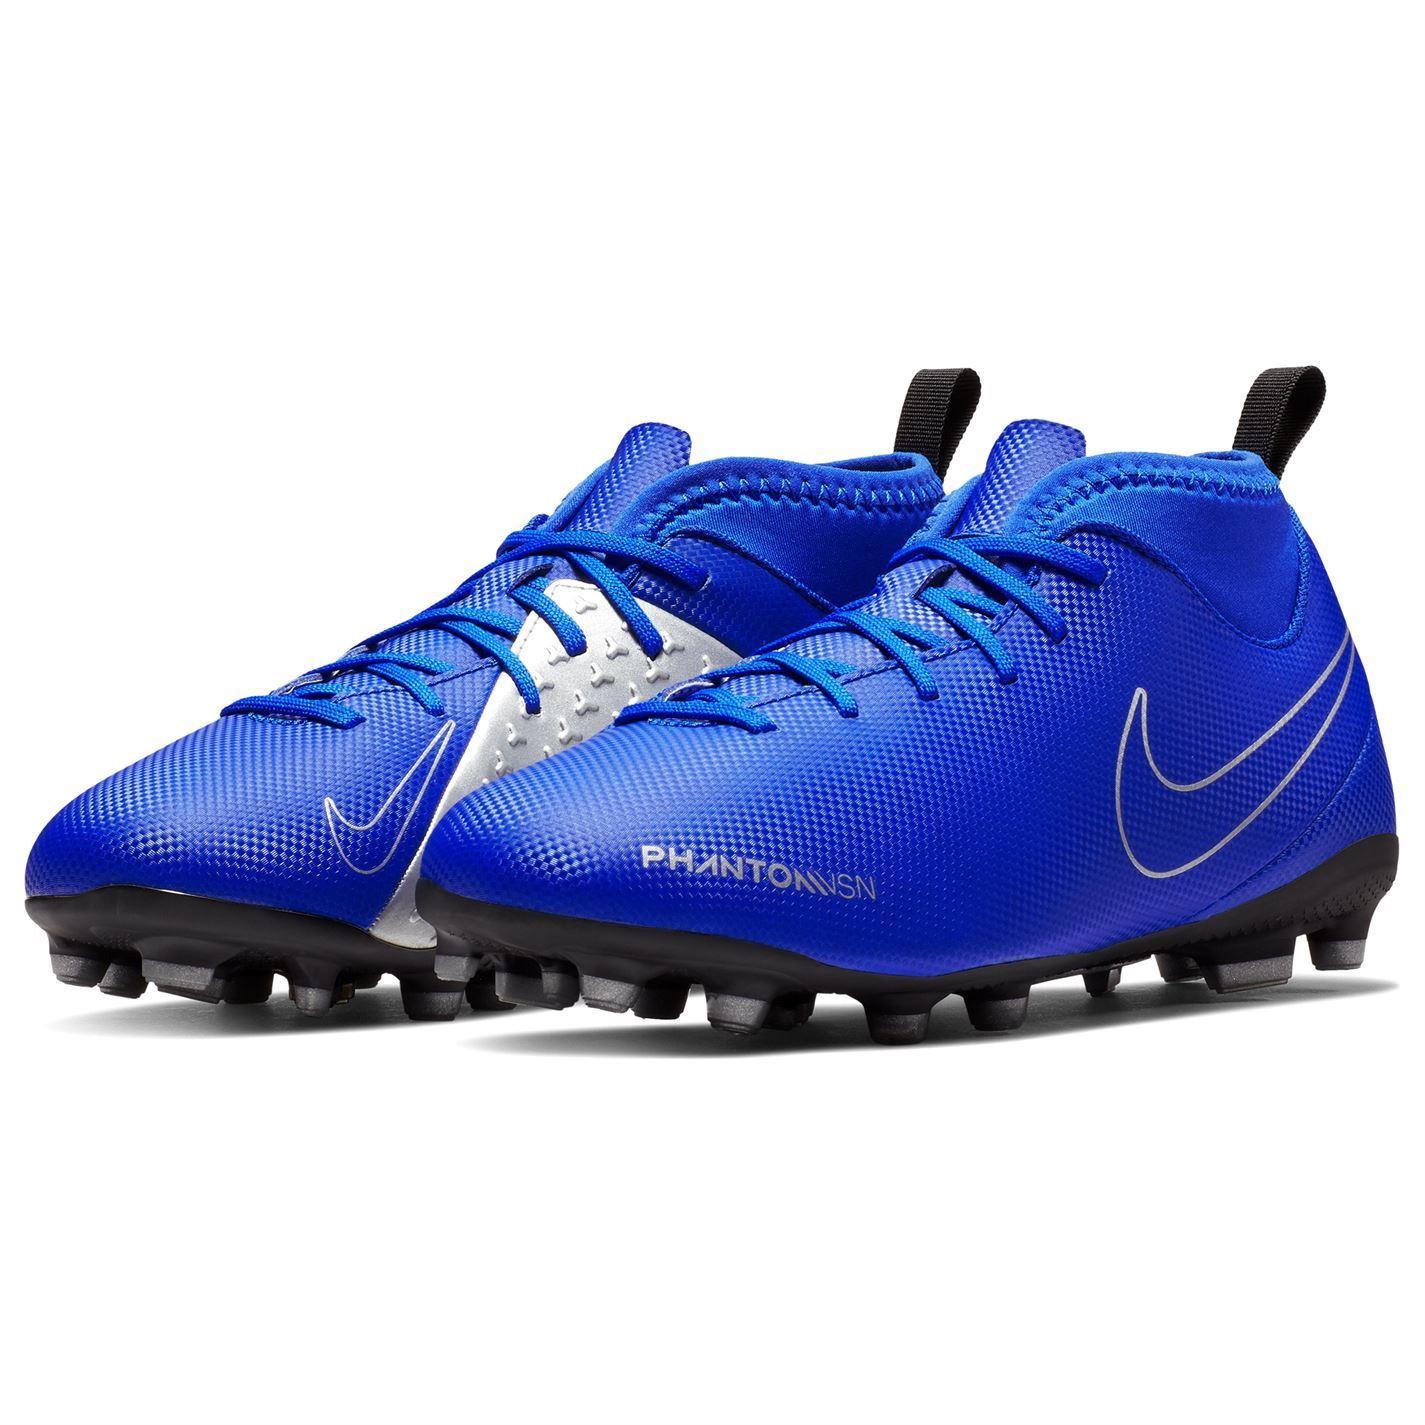 miniature 9 - Nike-Phantom-Vision-Club-DF-FG-Firm-Ground-Chaussures-De-Football-Juniors-Football-Crampons